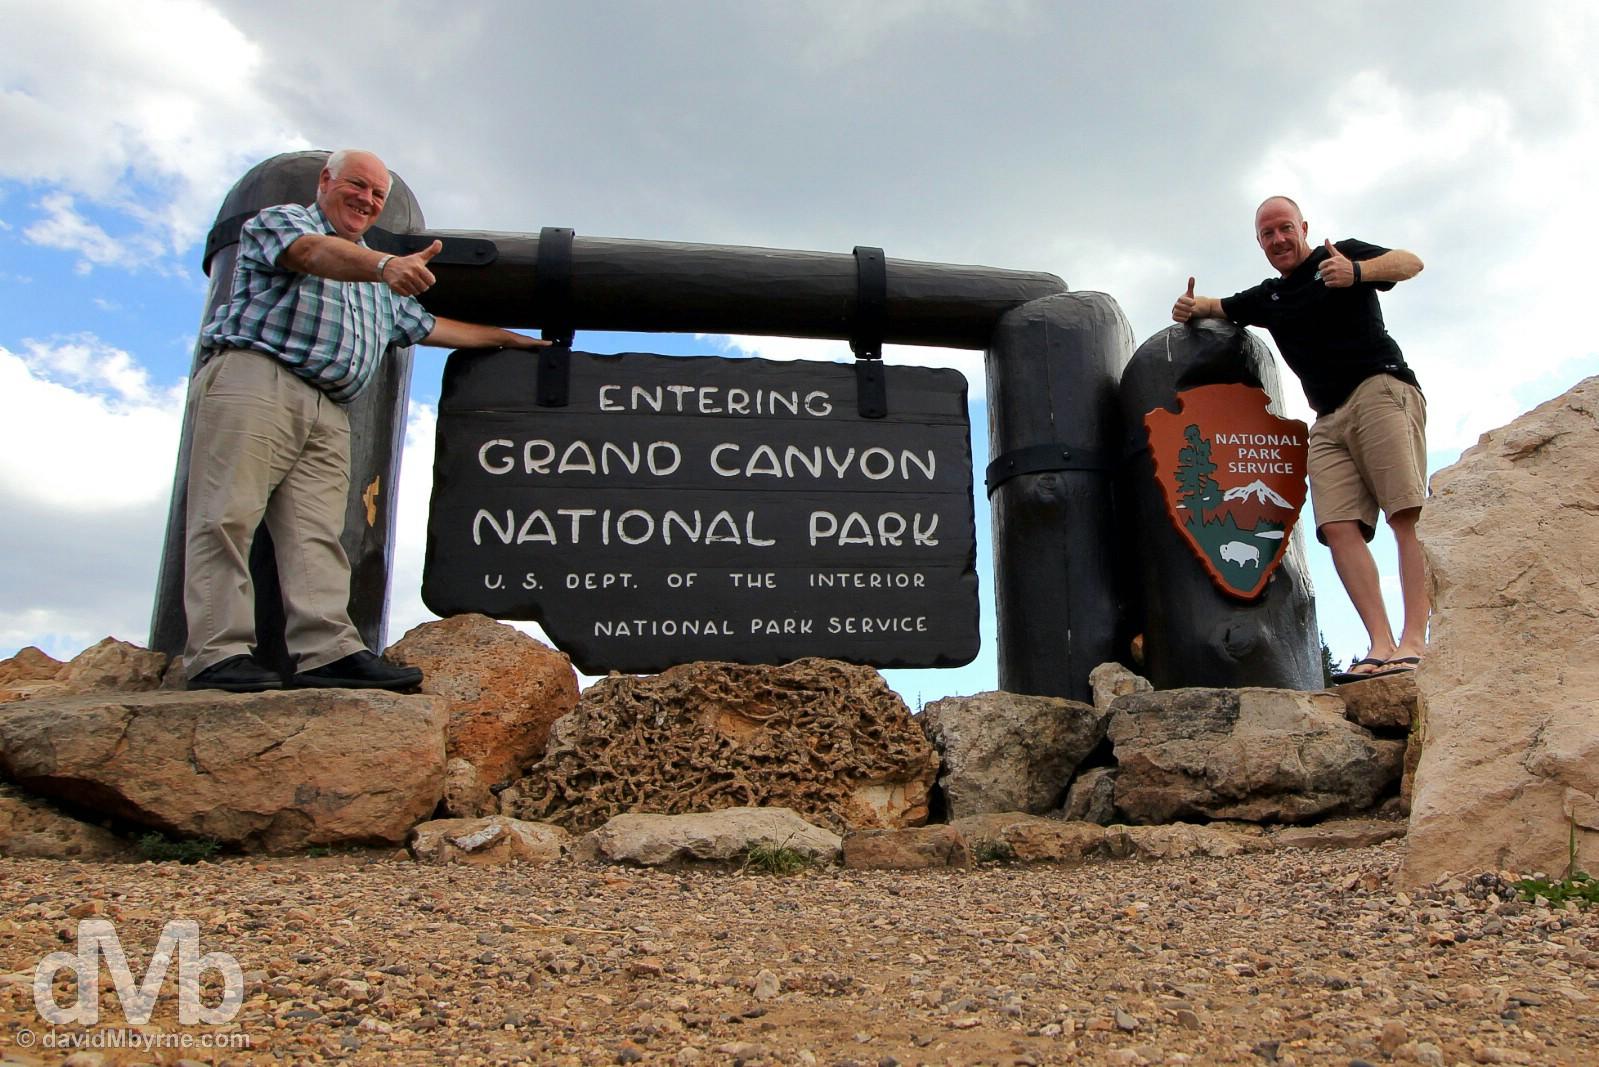 Grand Canyon National Park North Rim, Arizona, USA. September 9, 2016.